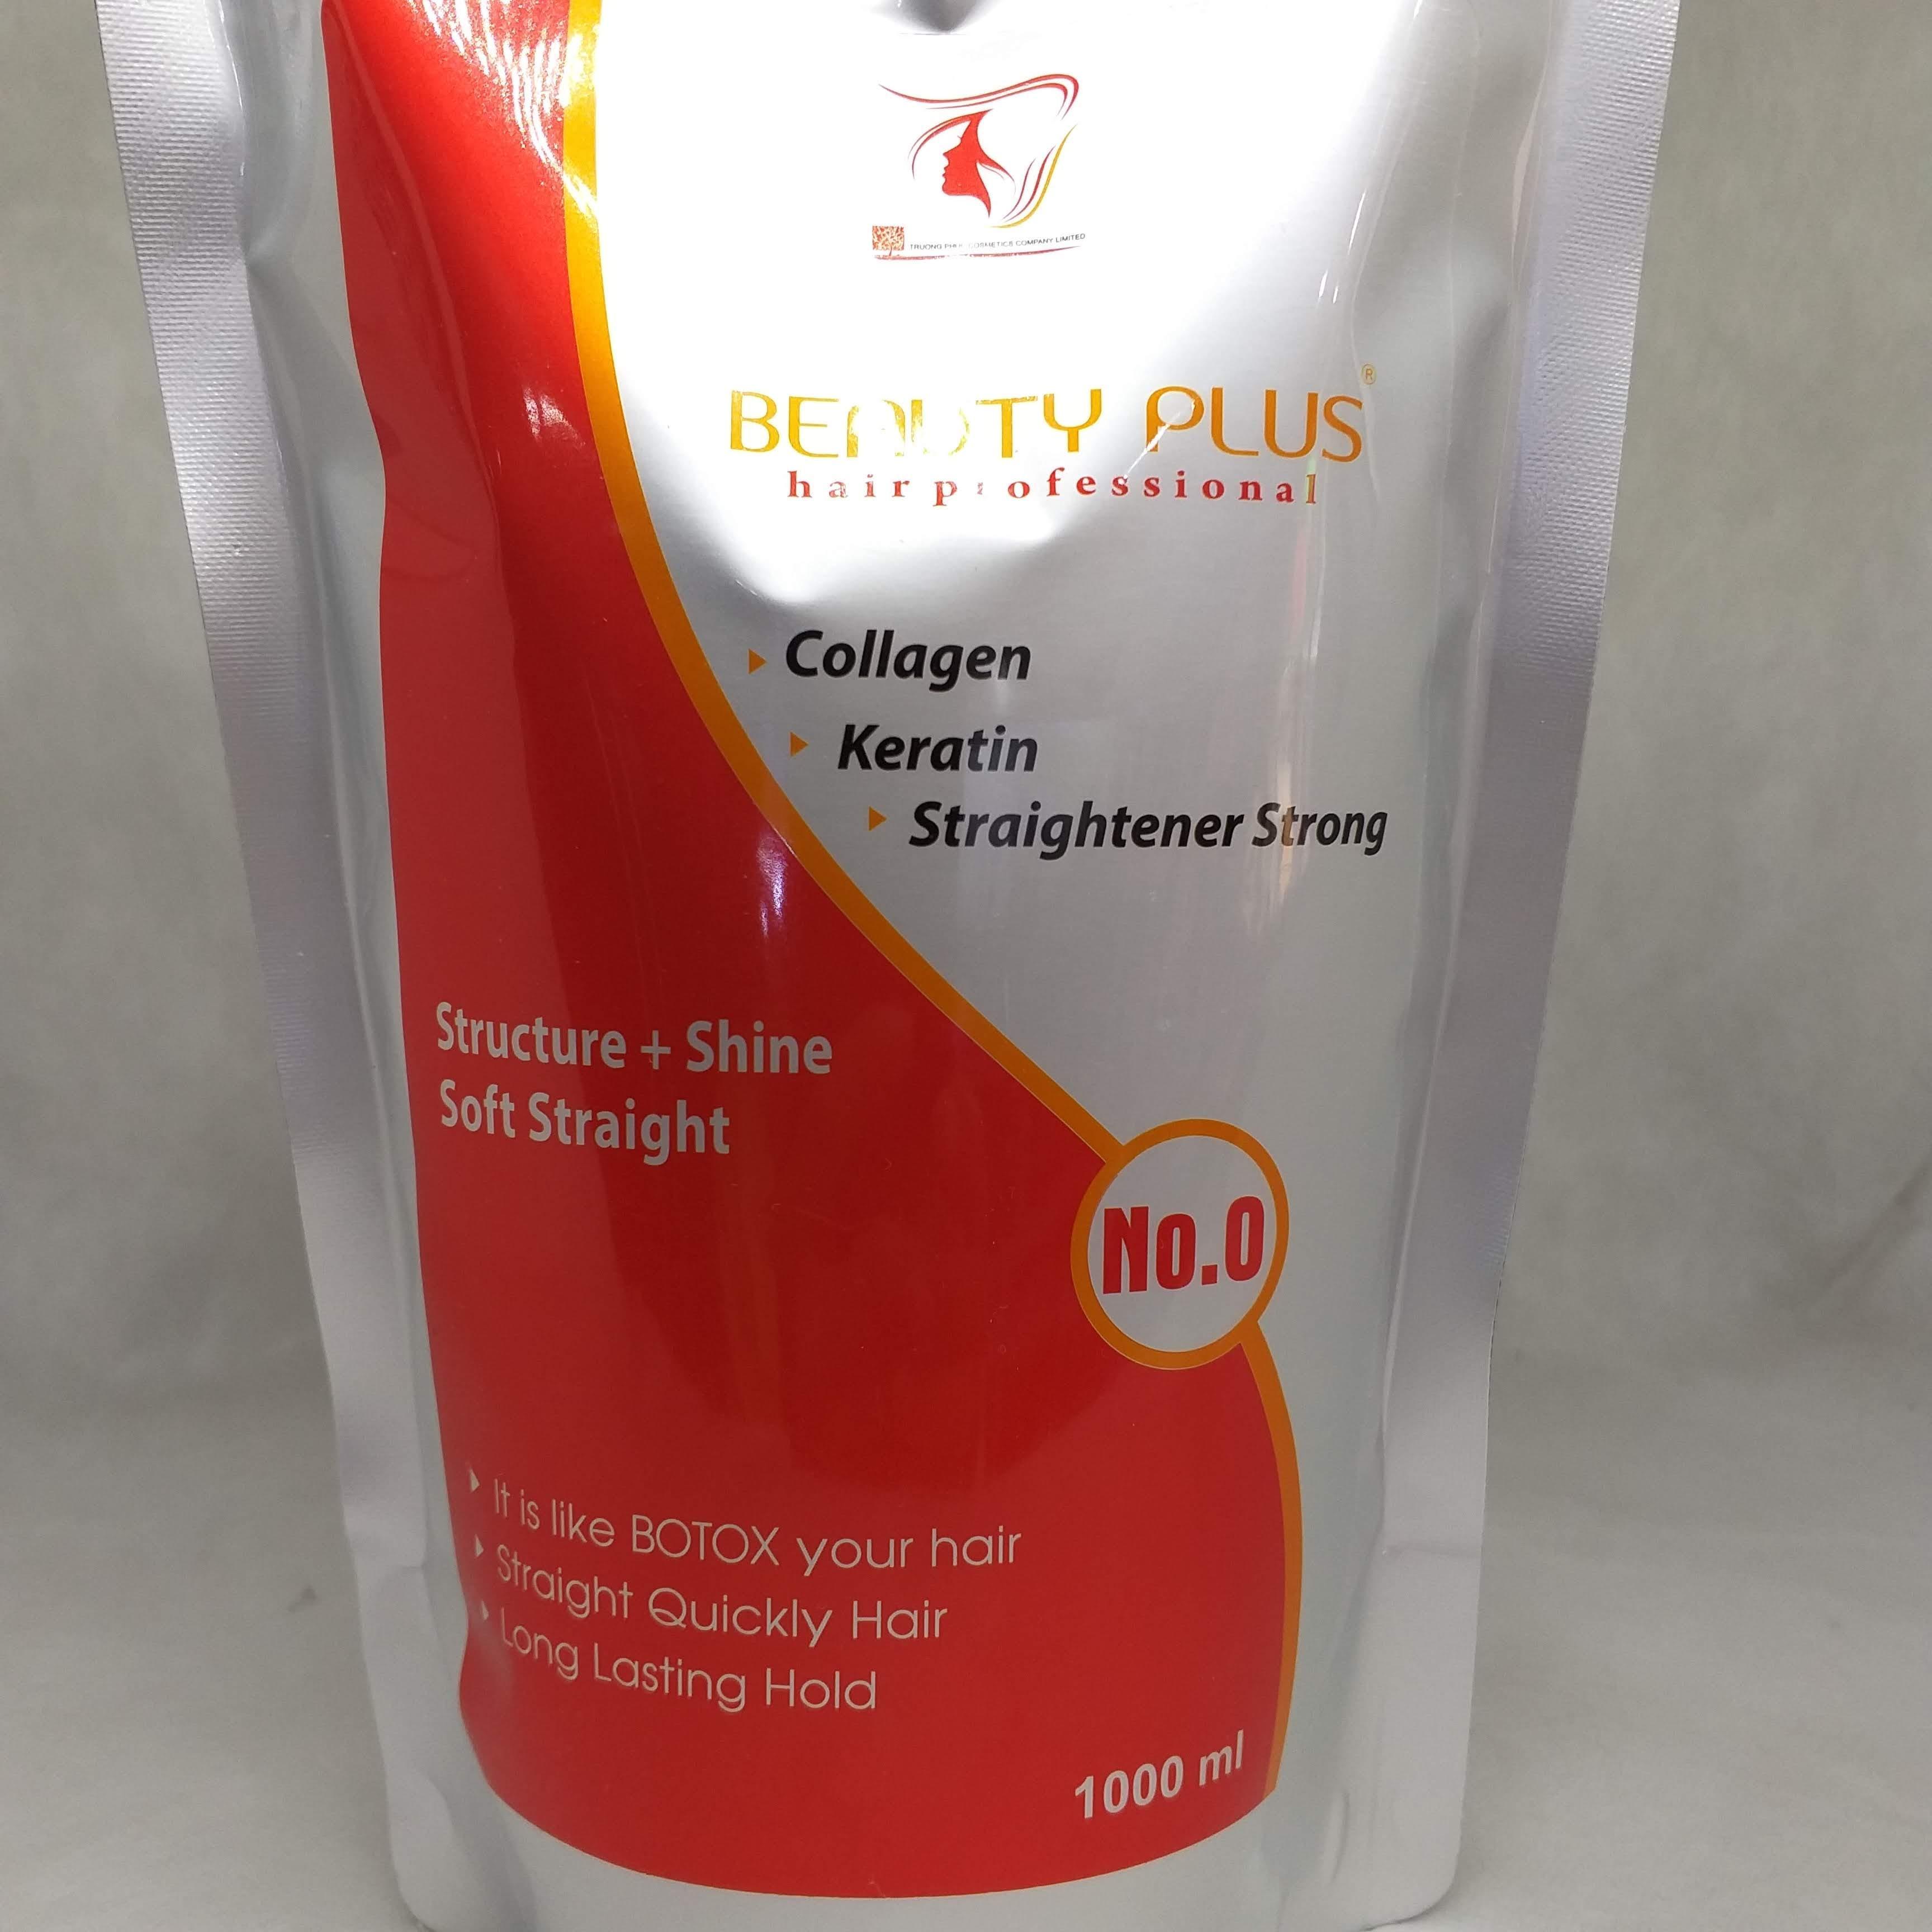 Kem duỗi tóc khỏe Beauty Hair 1000 ml giá rẻ